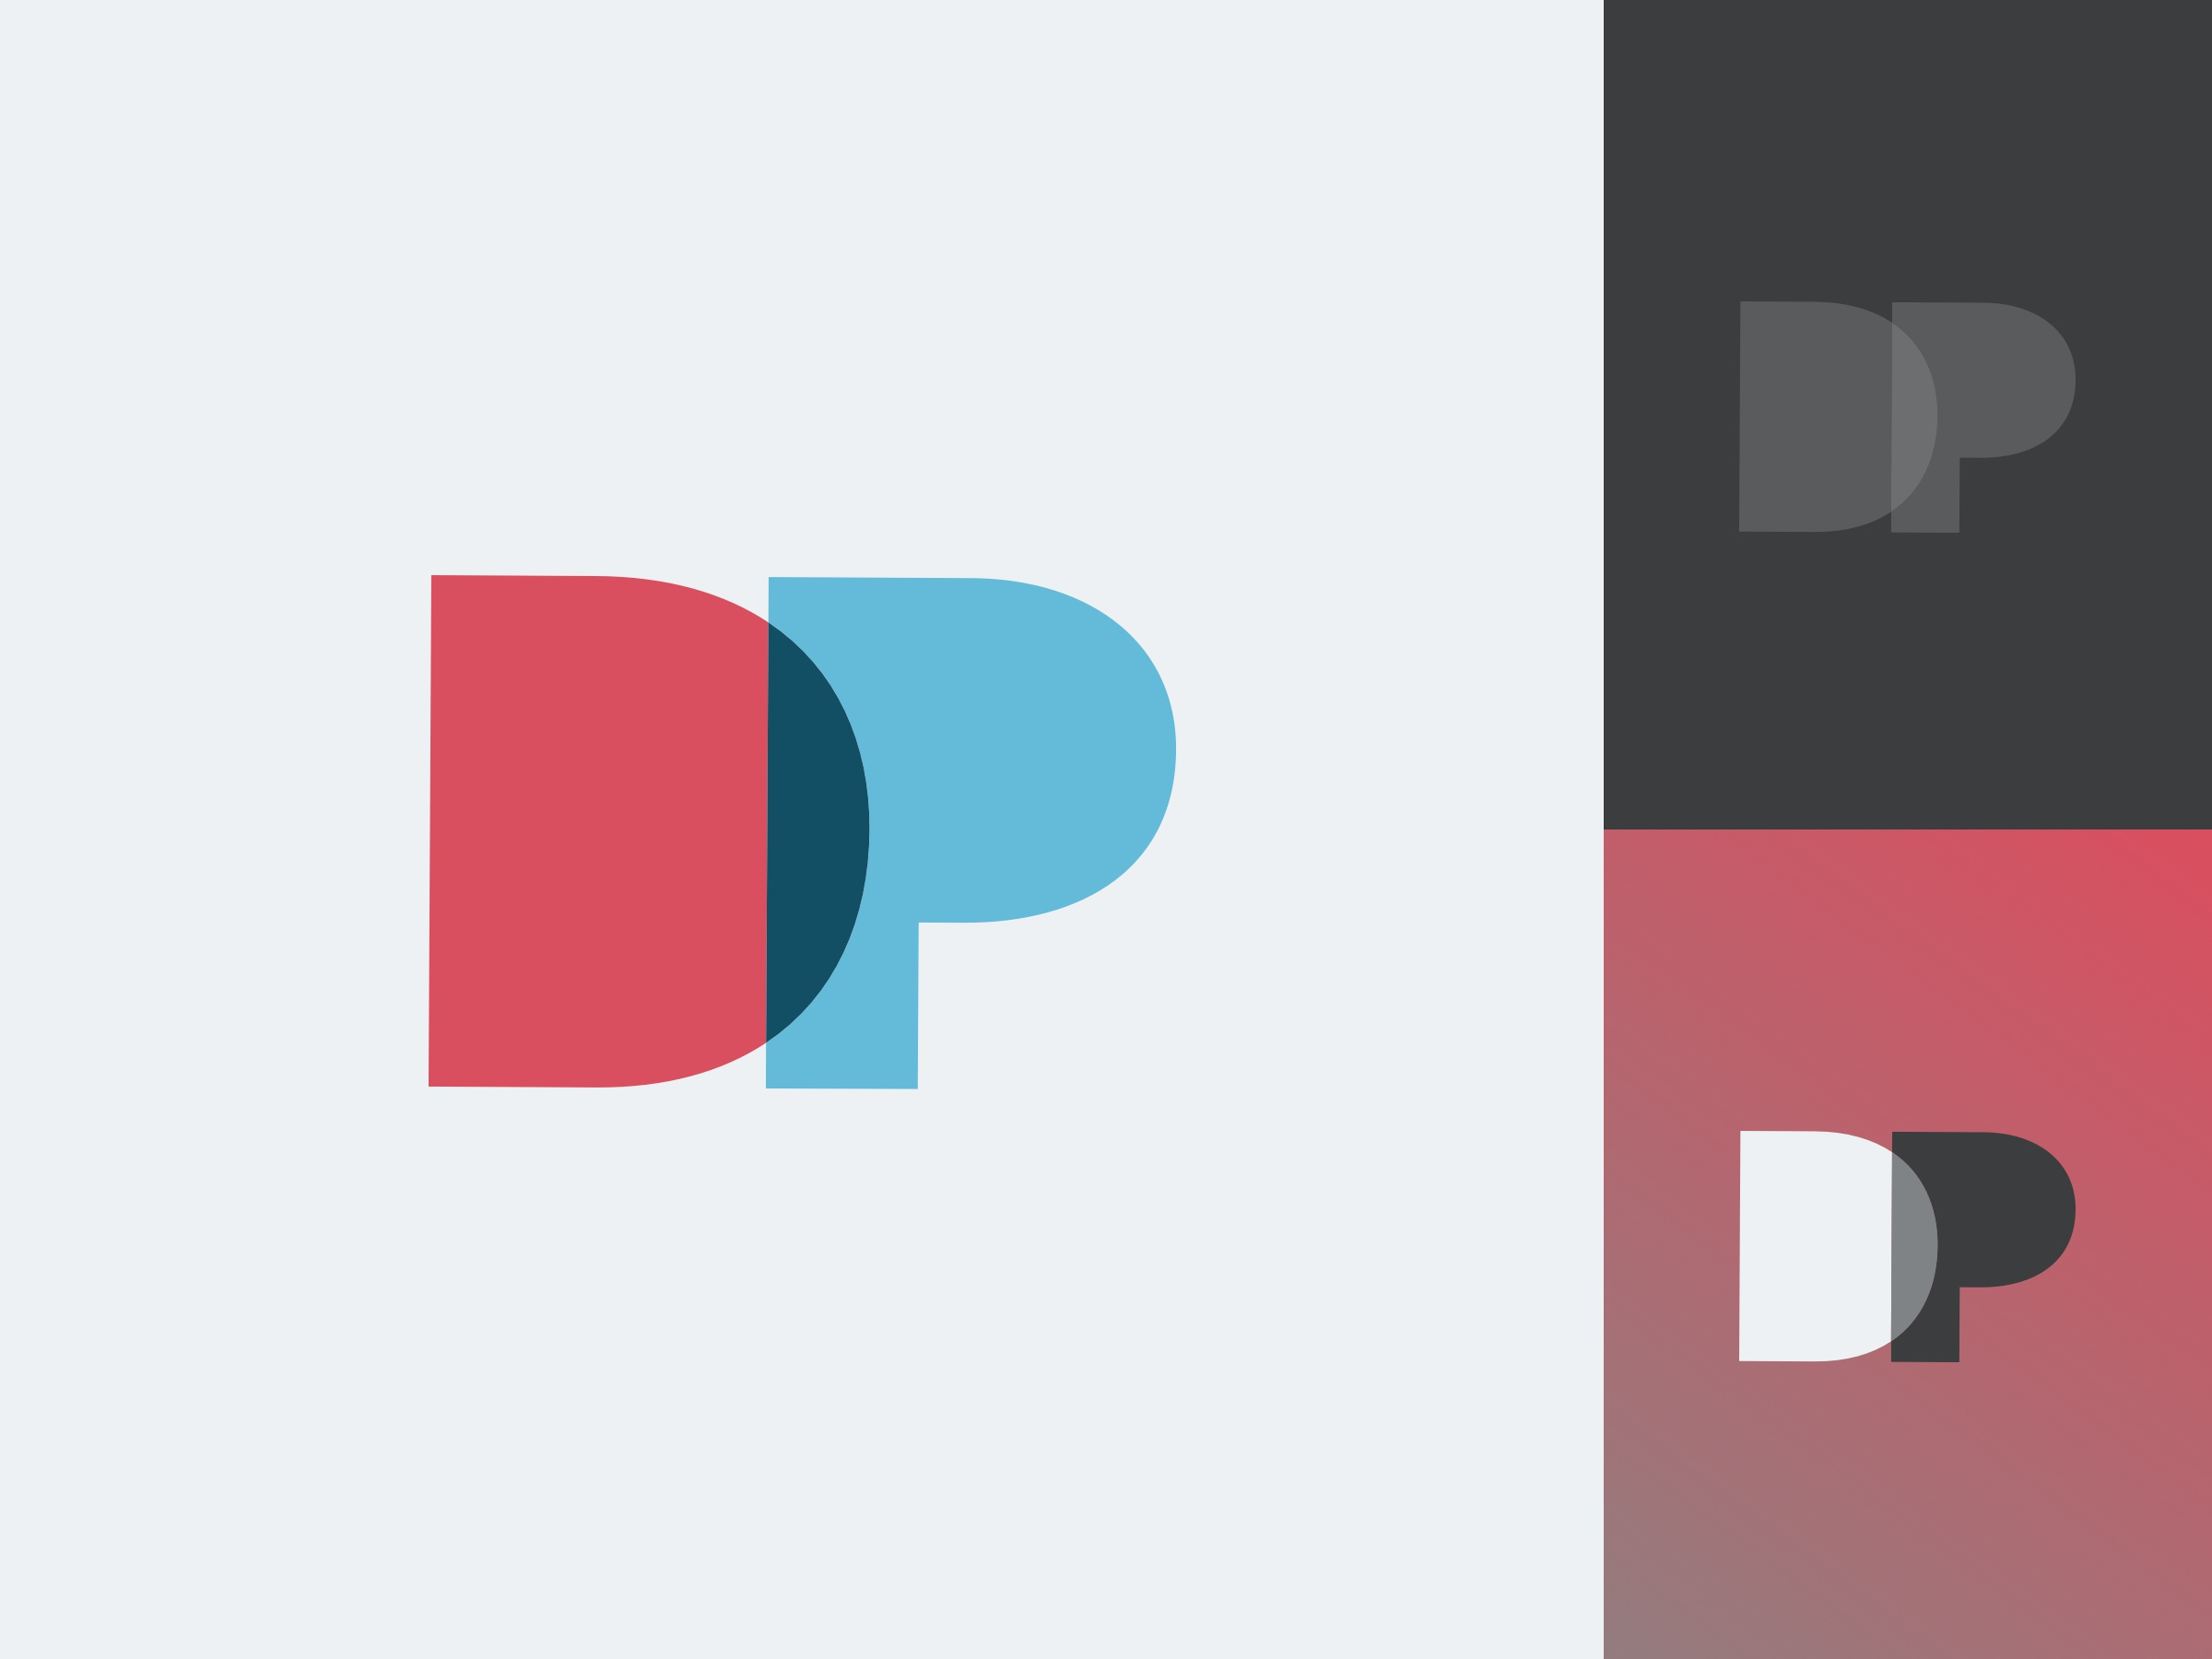 Logos 3x